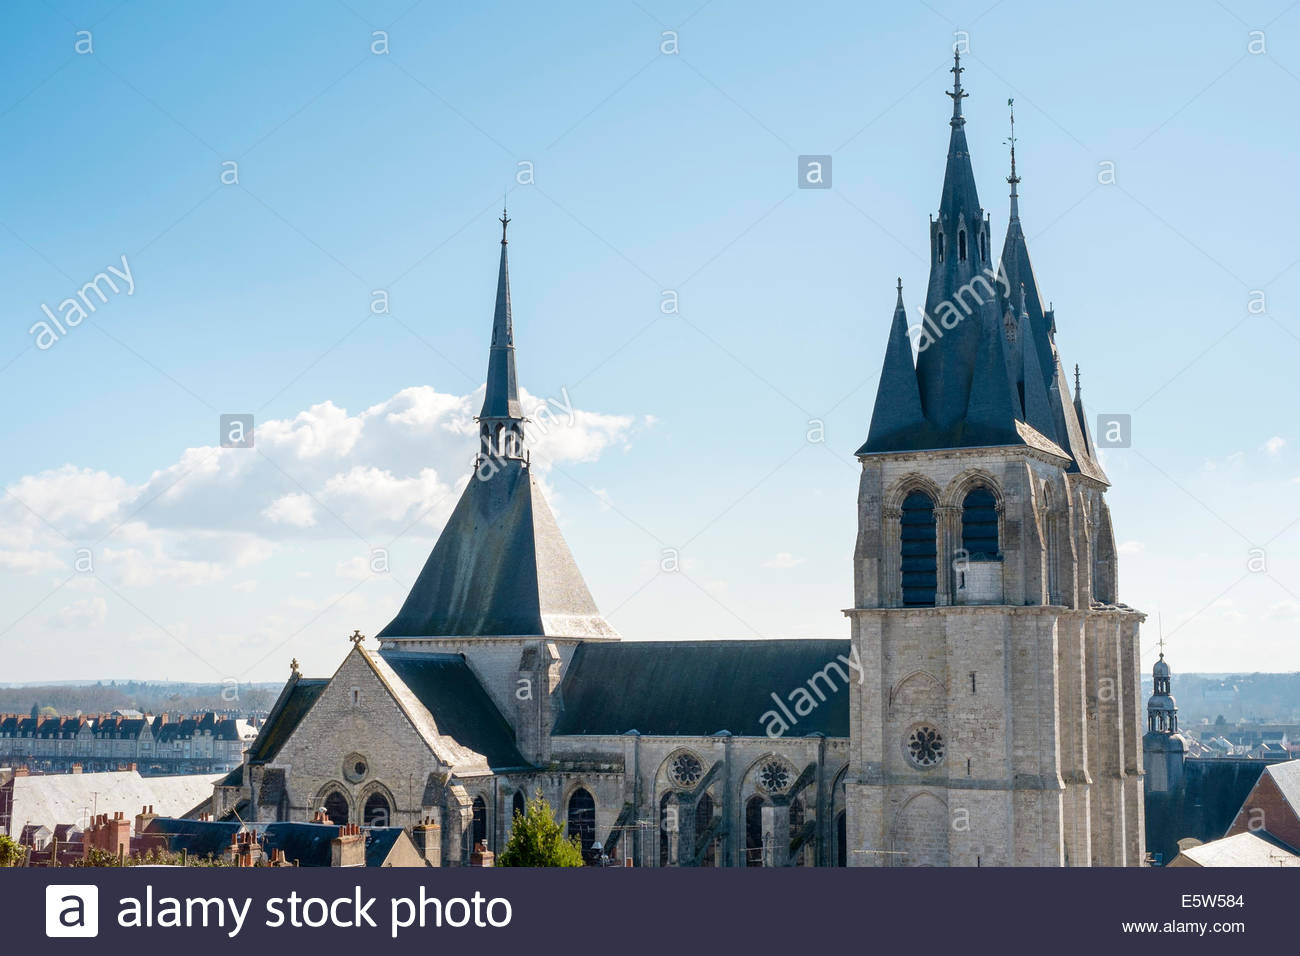 Three spires of Eglise St-Nicolas church, Blois, Loire-et-Cher, Centre, France - Stock Image